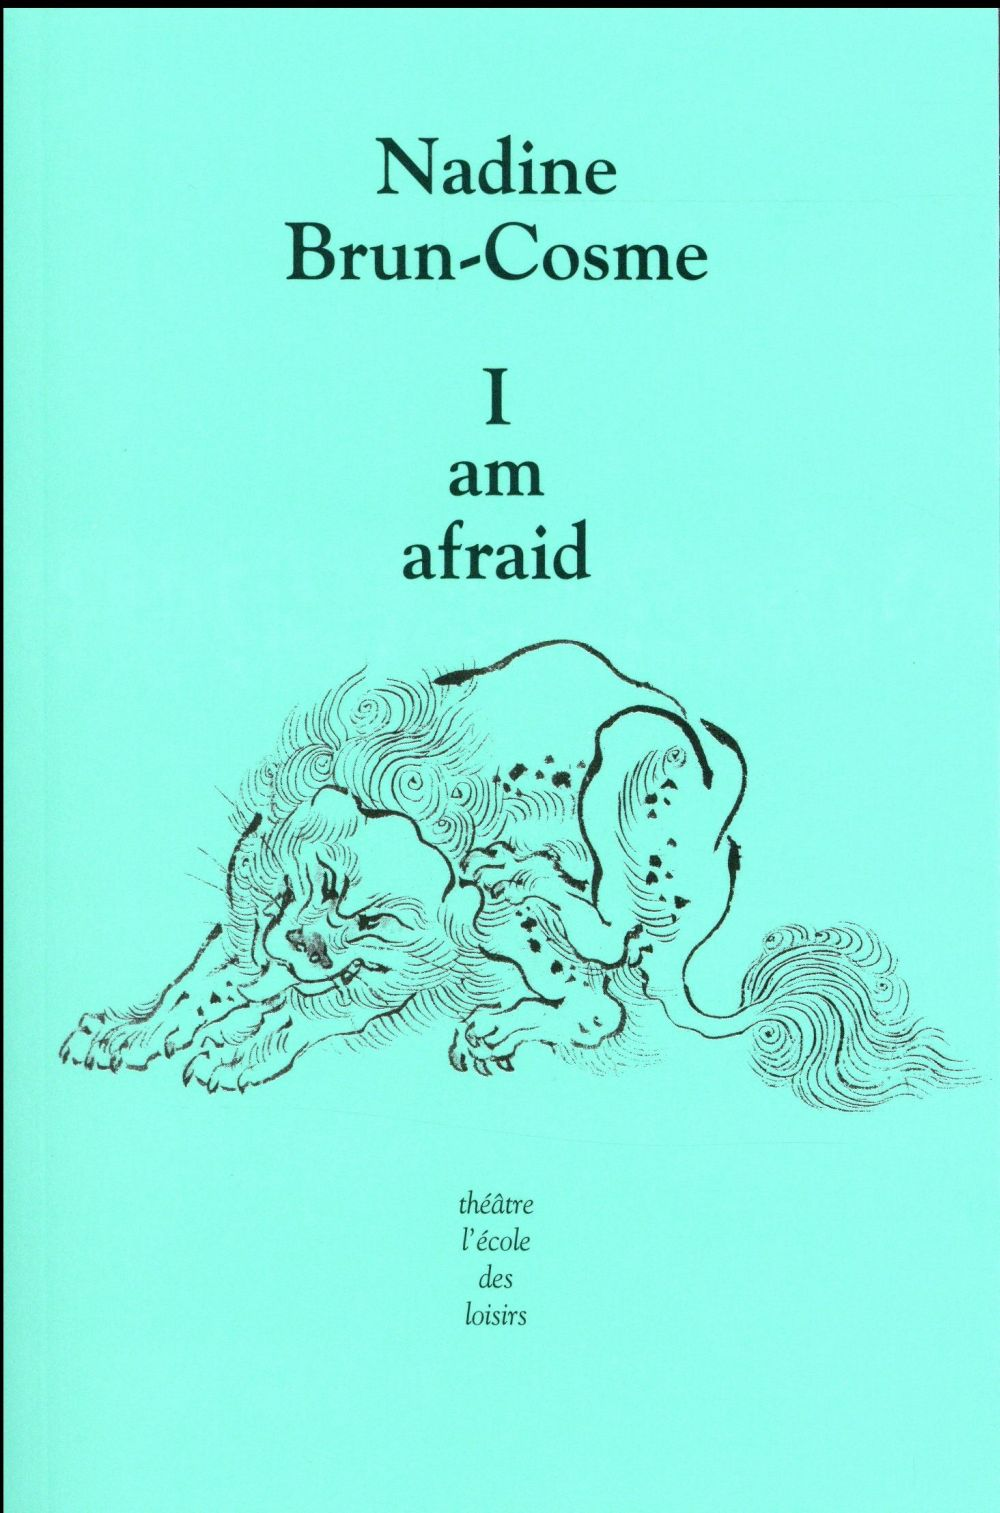 I am afraid